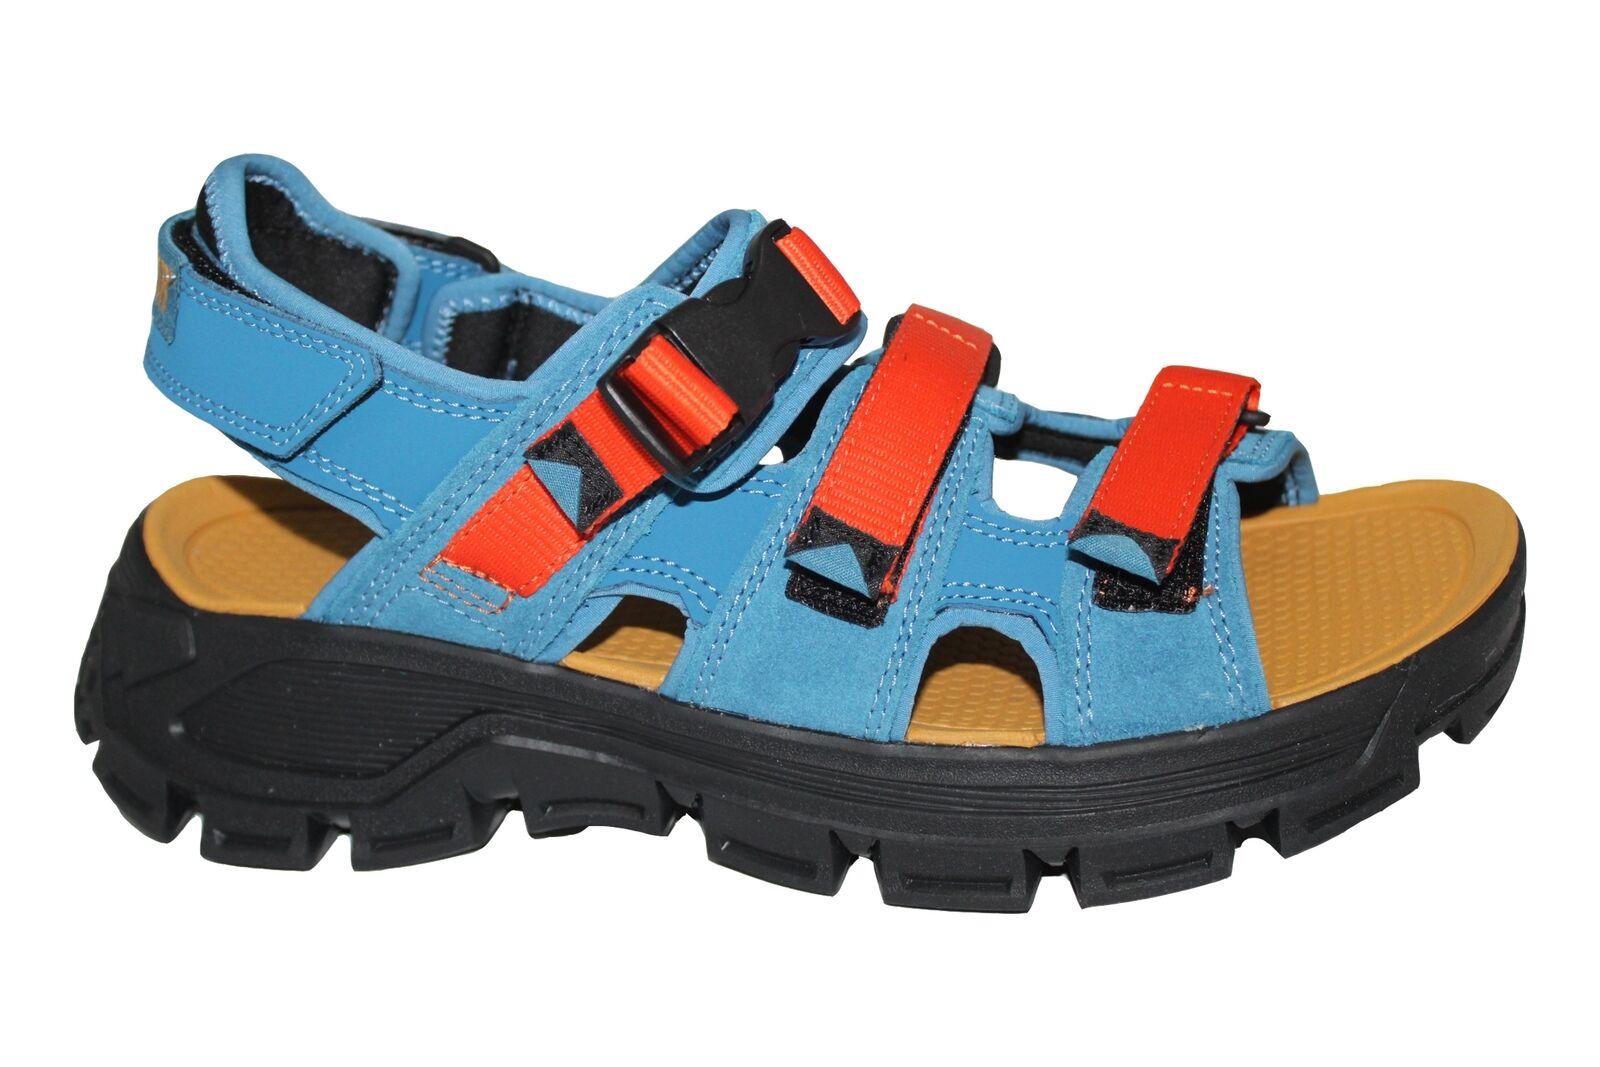 Caterpillar Progressor Blue Buckle 4 Strap Comfort Hiking Sandals